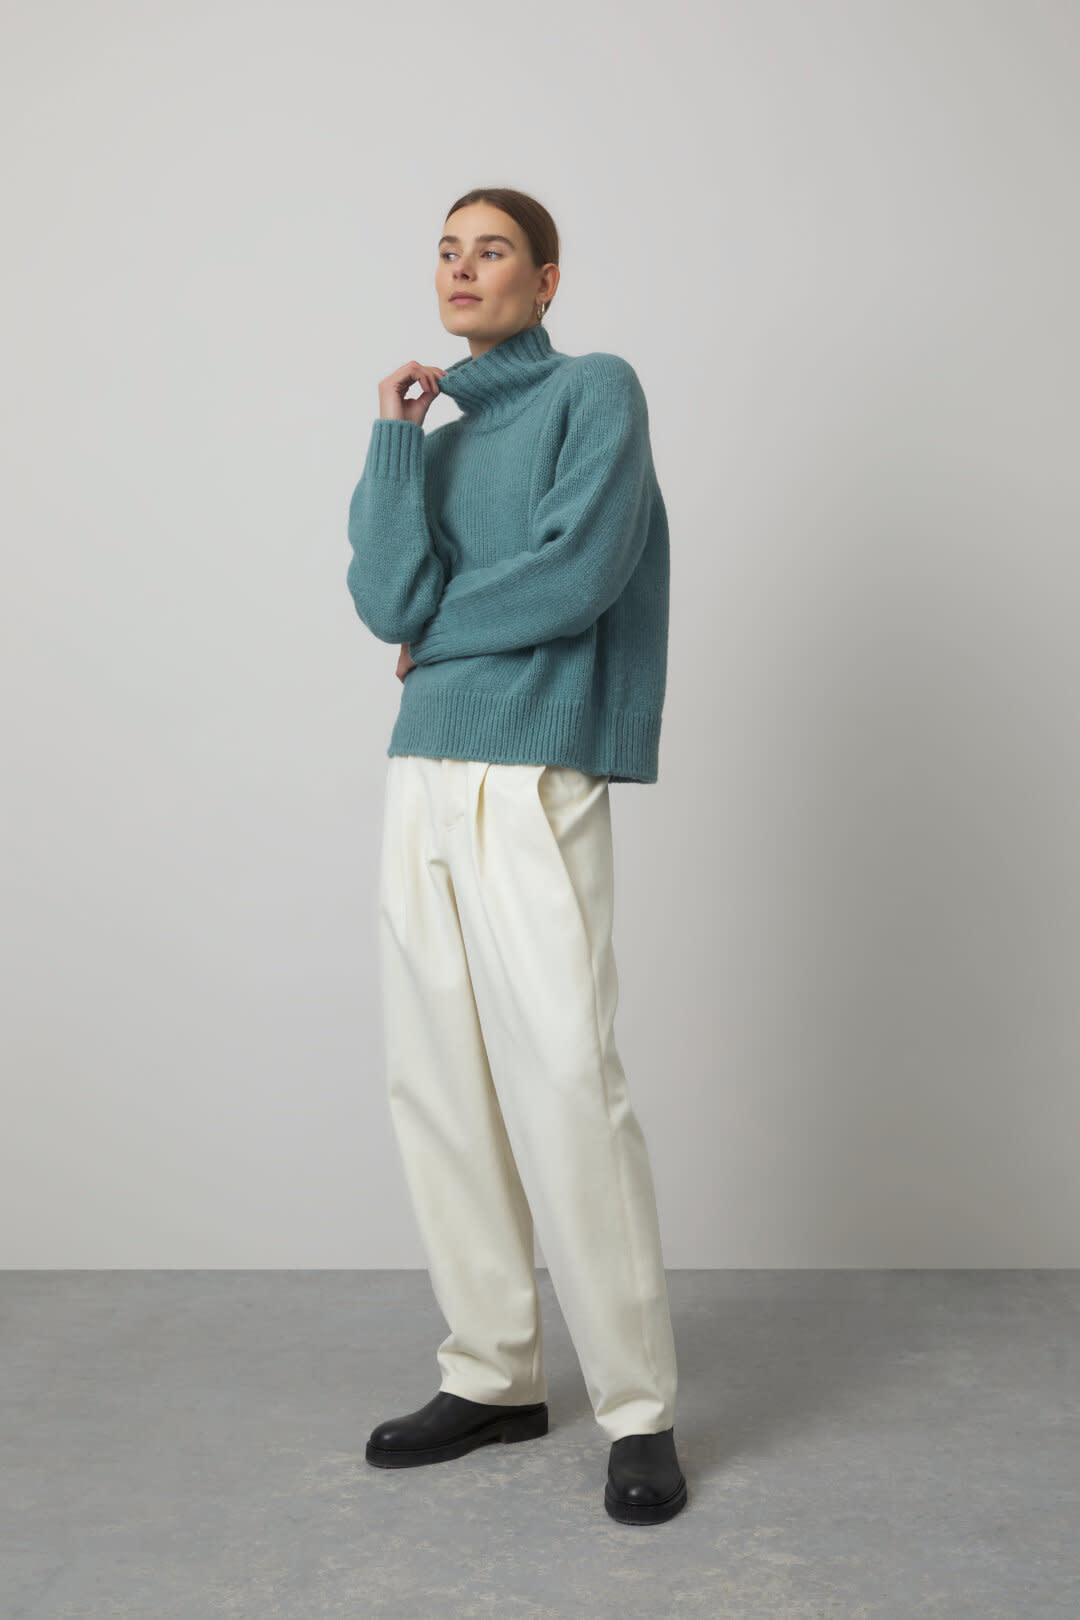 Alpaca Mix Knit Sweater - Teal-2